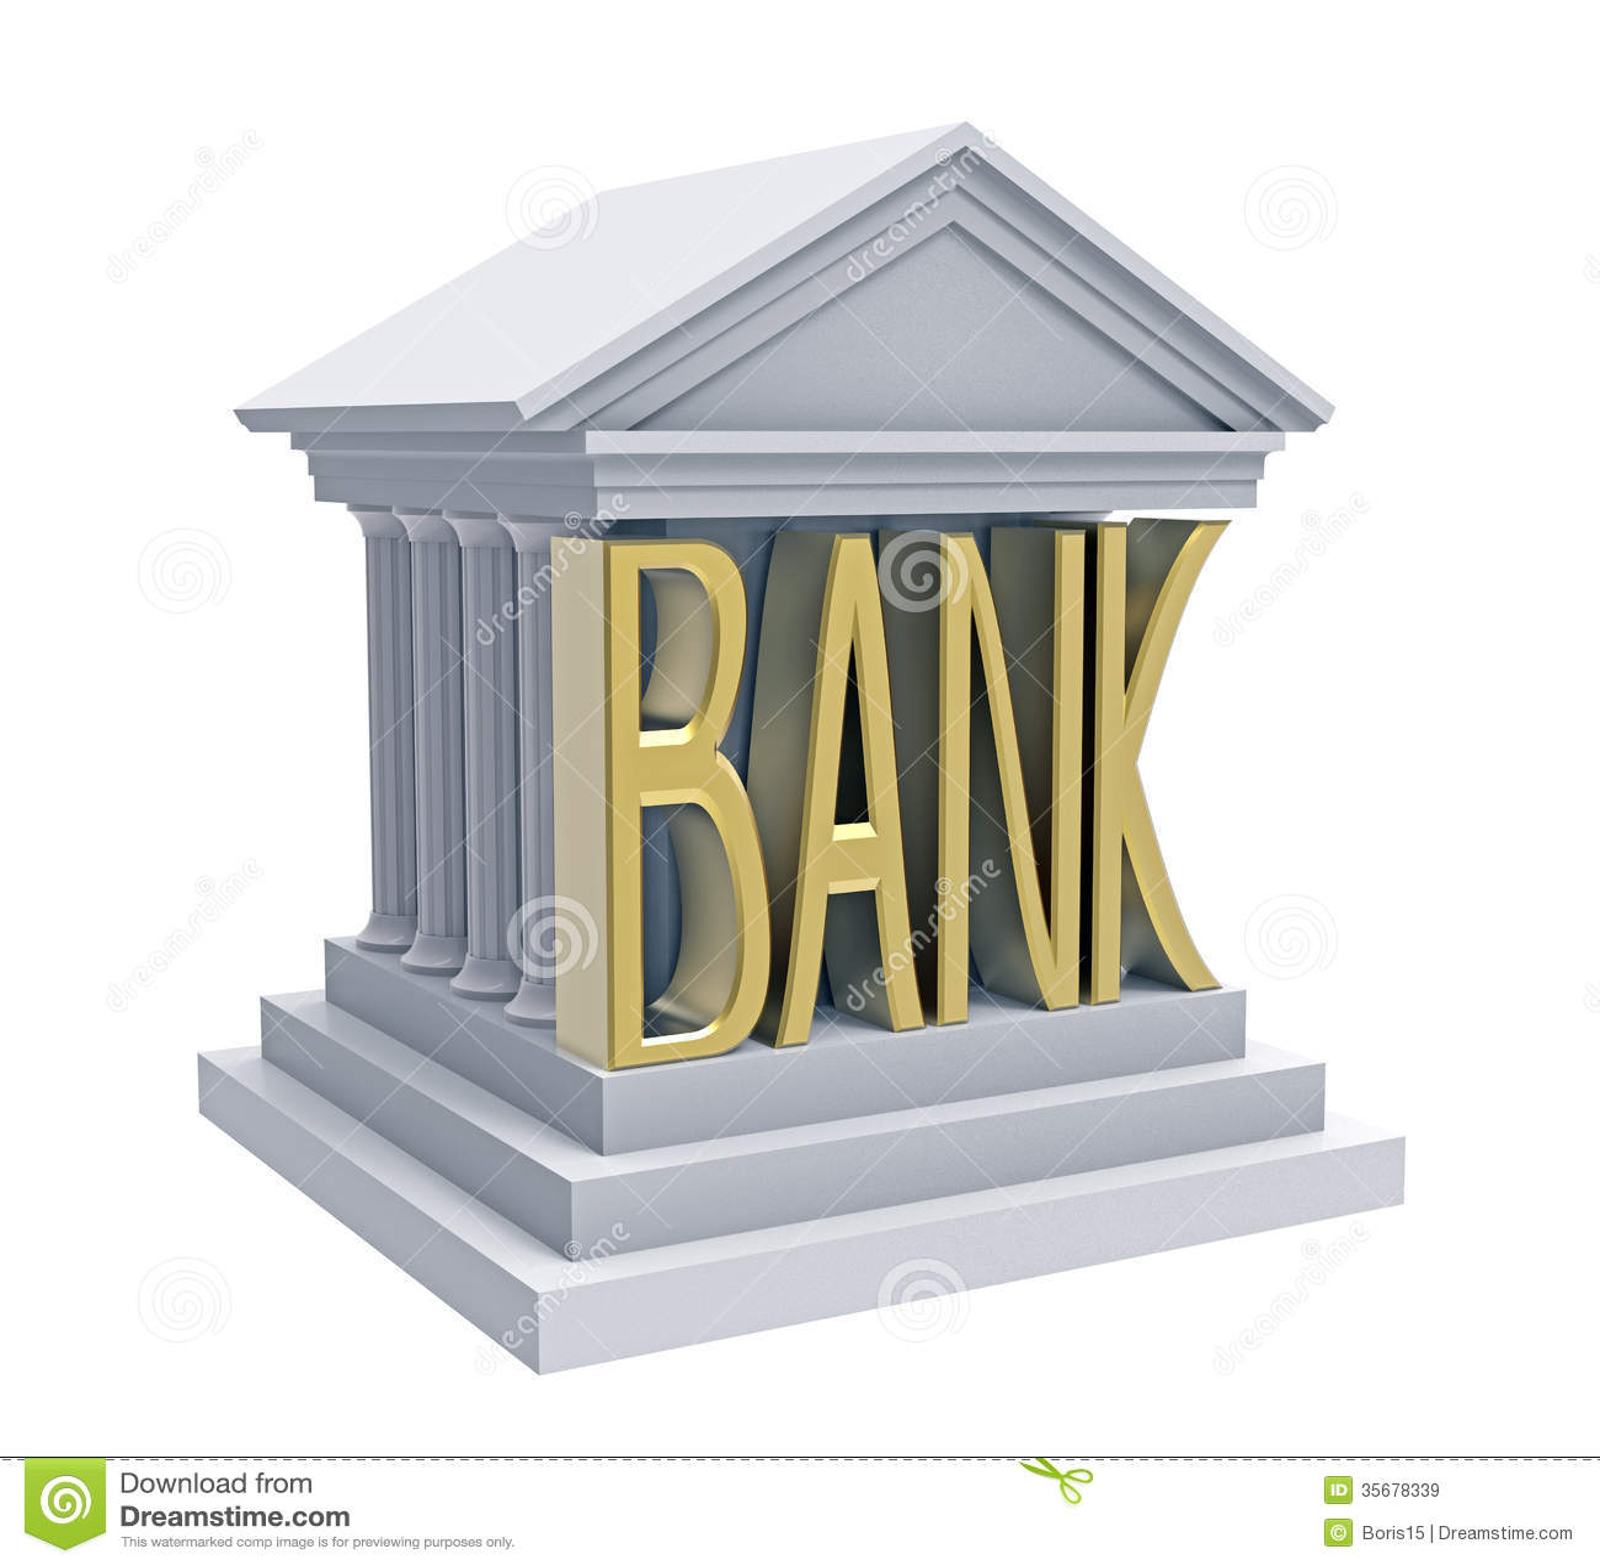 банк клипарт: